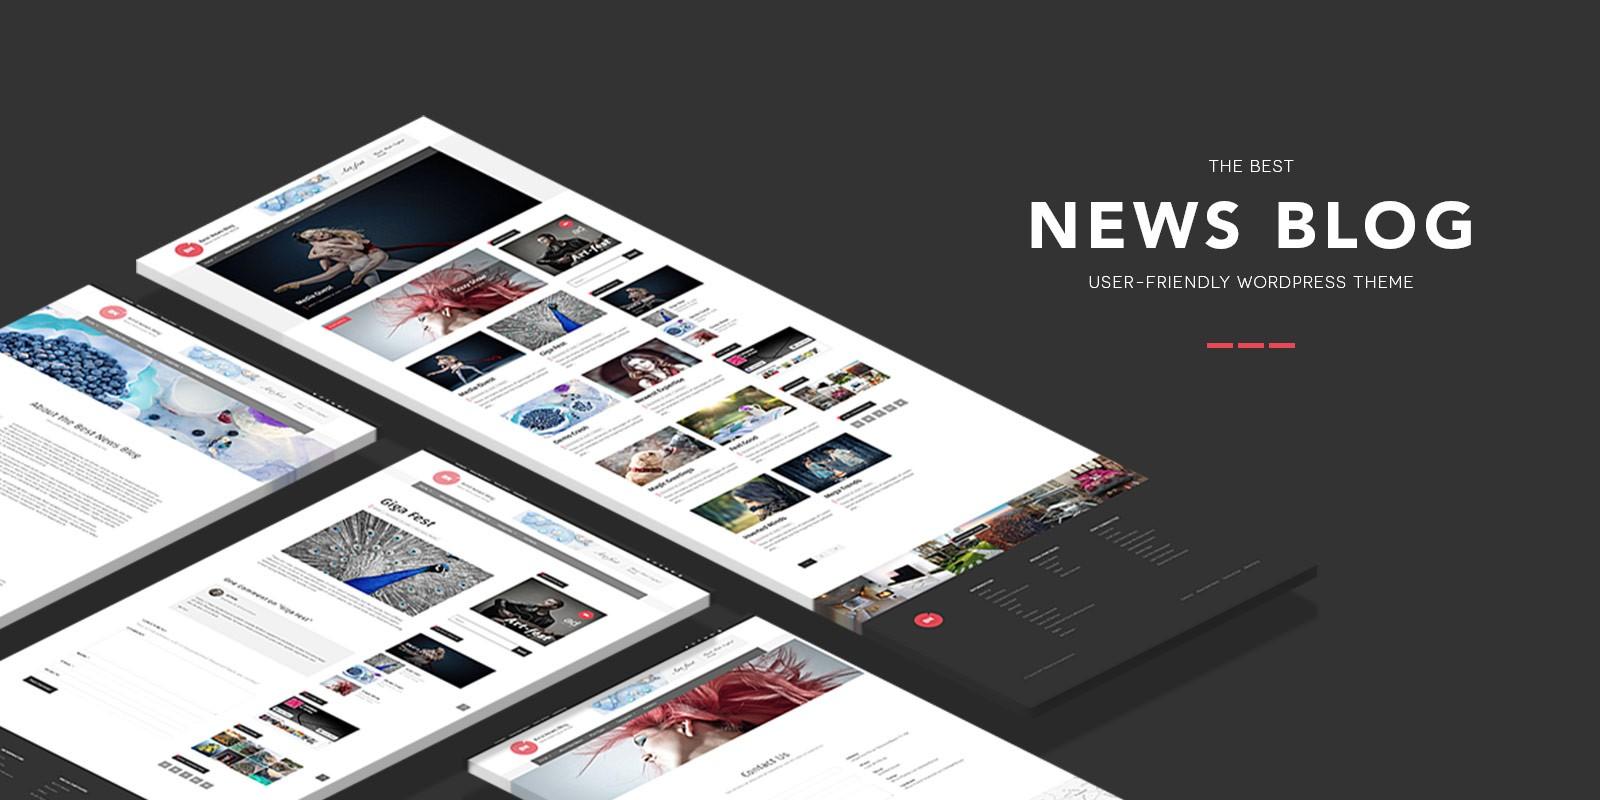 Best News Blog WordPress theme